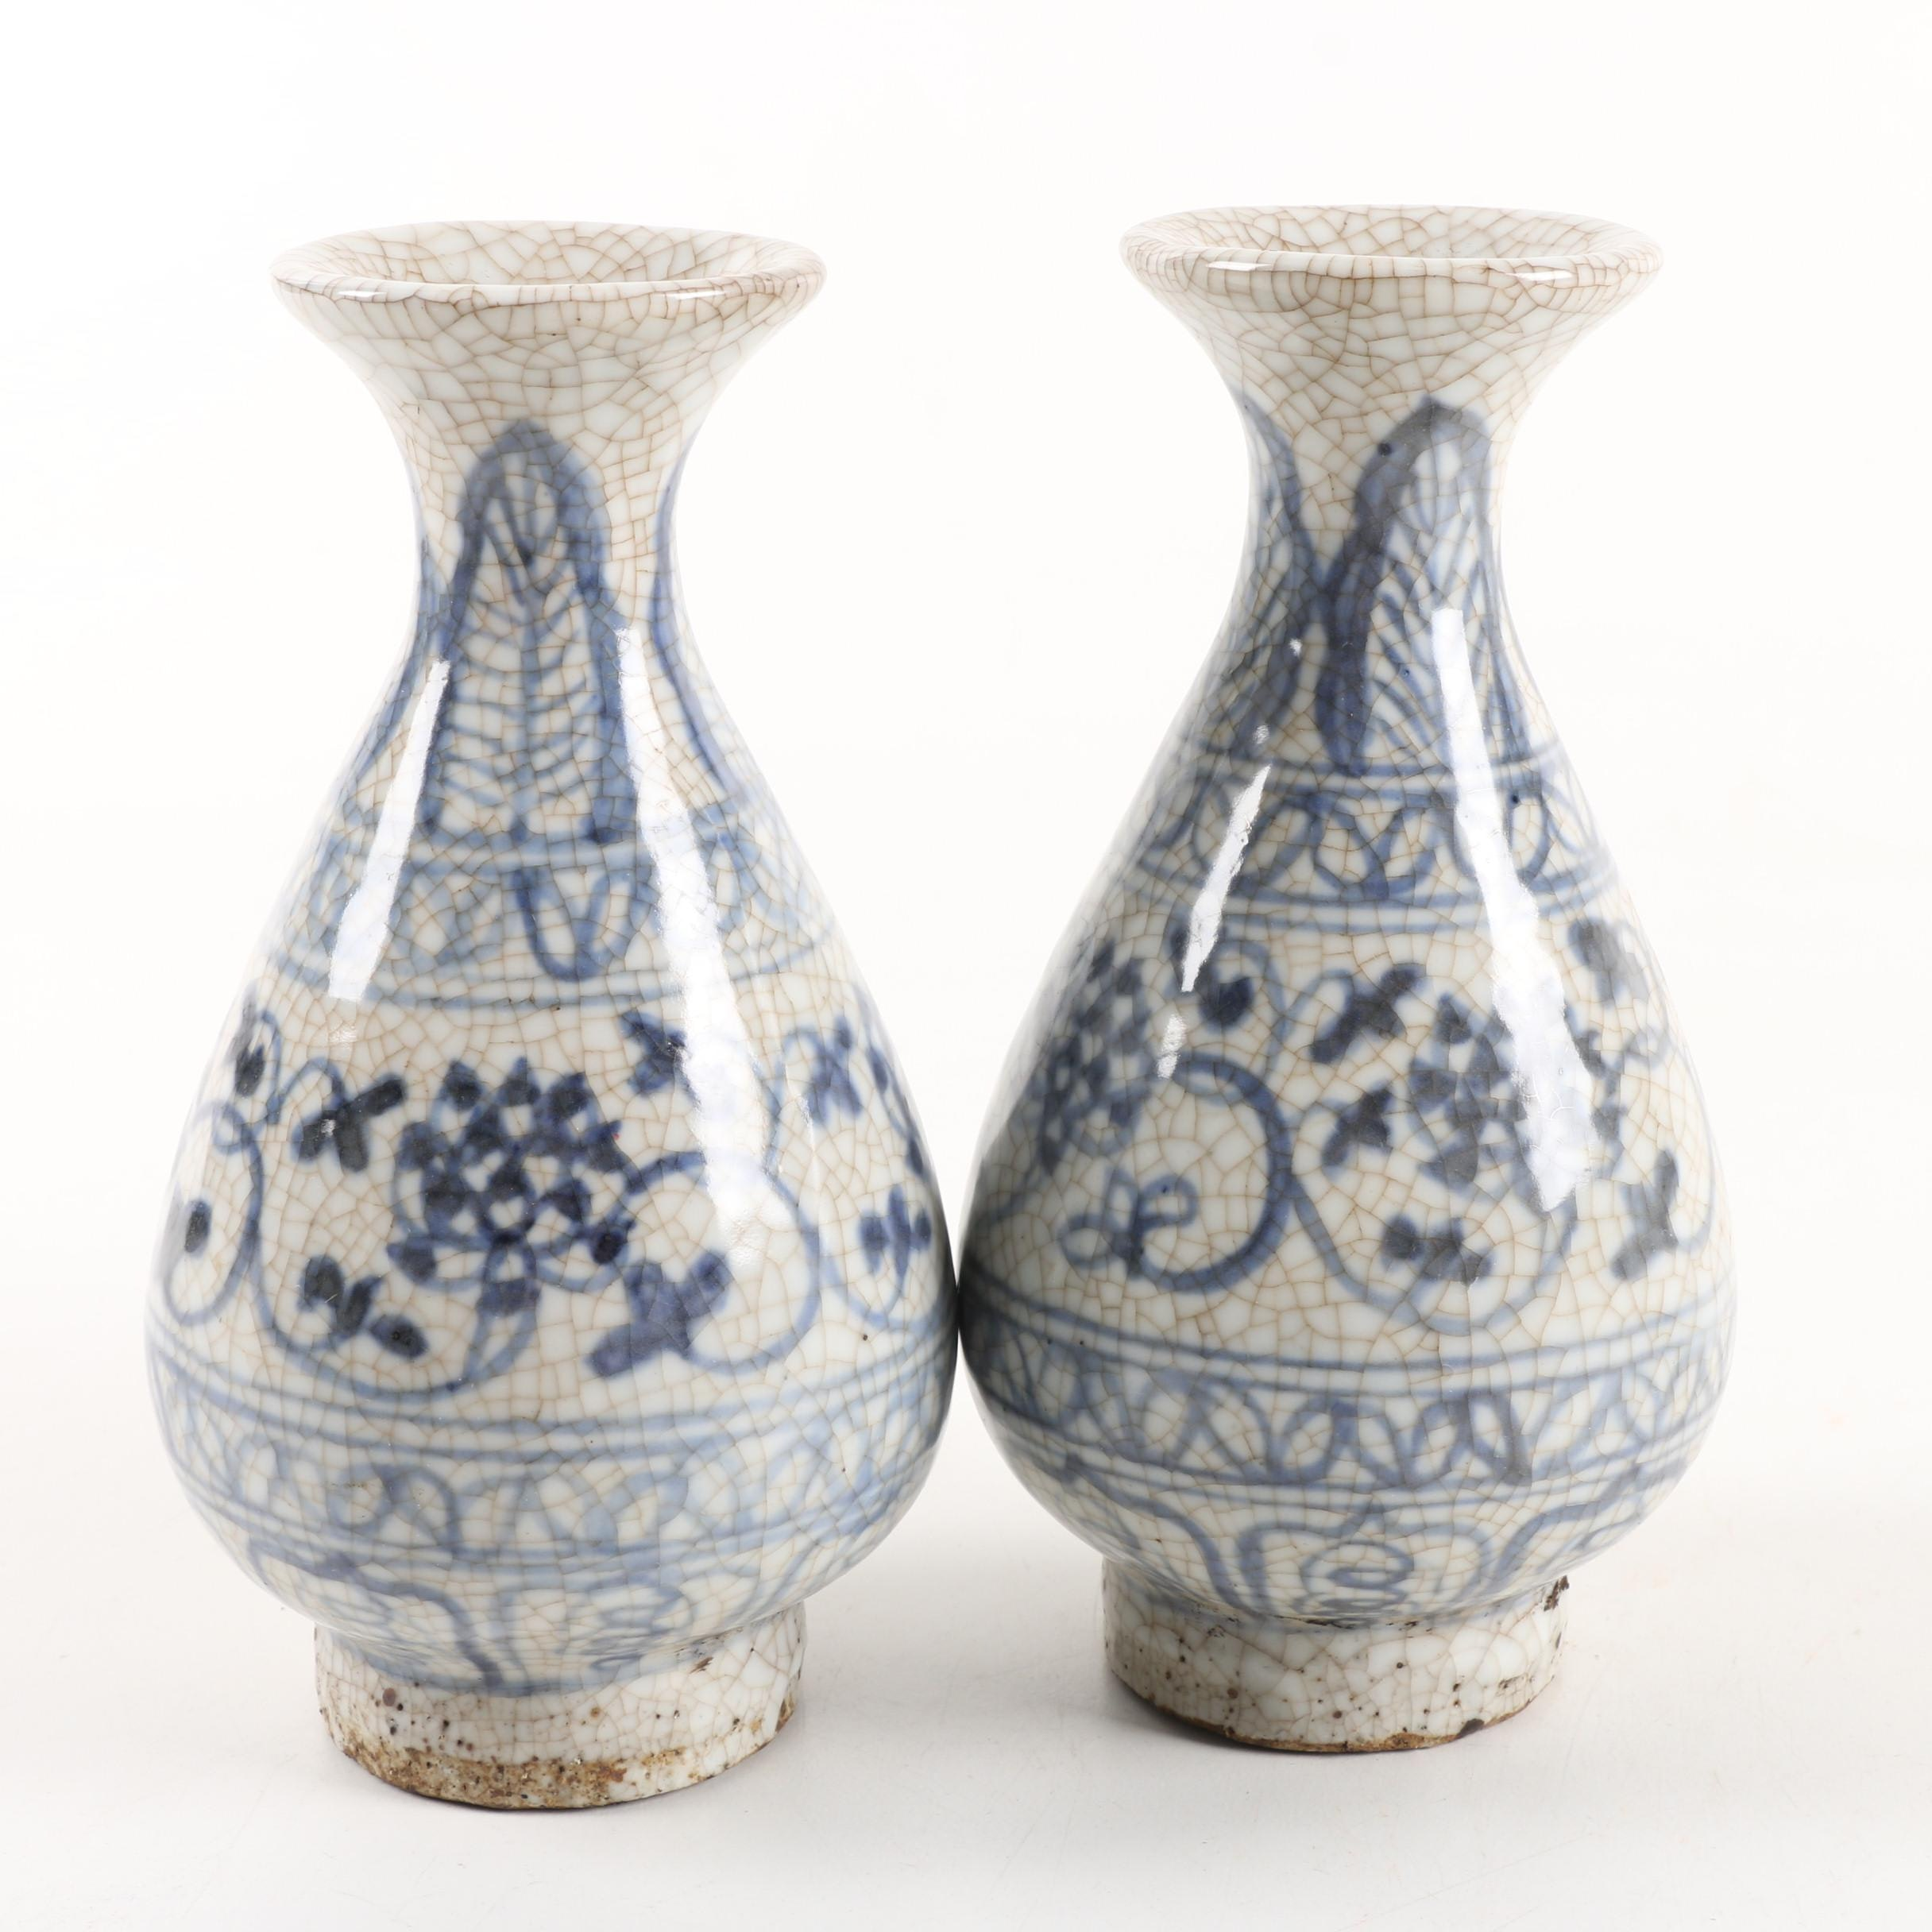 Chinese Blue and White Ceramic Bud Vases